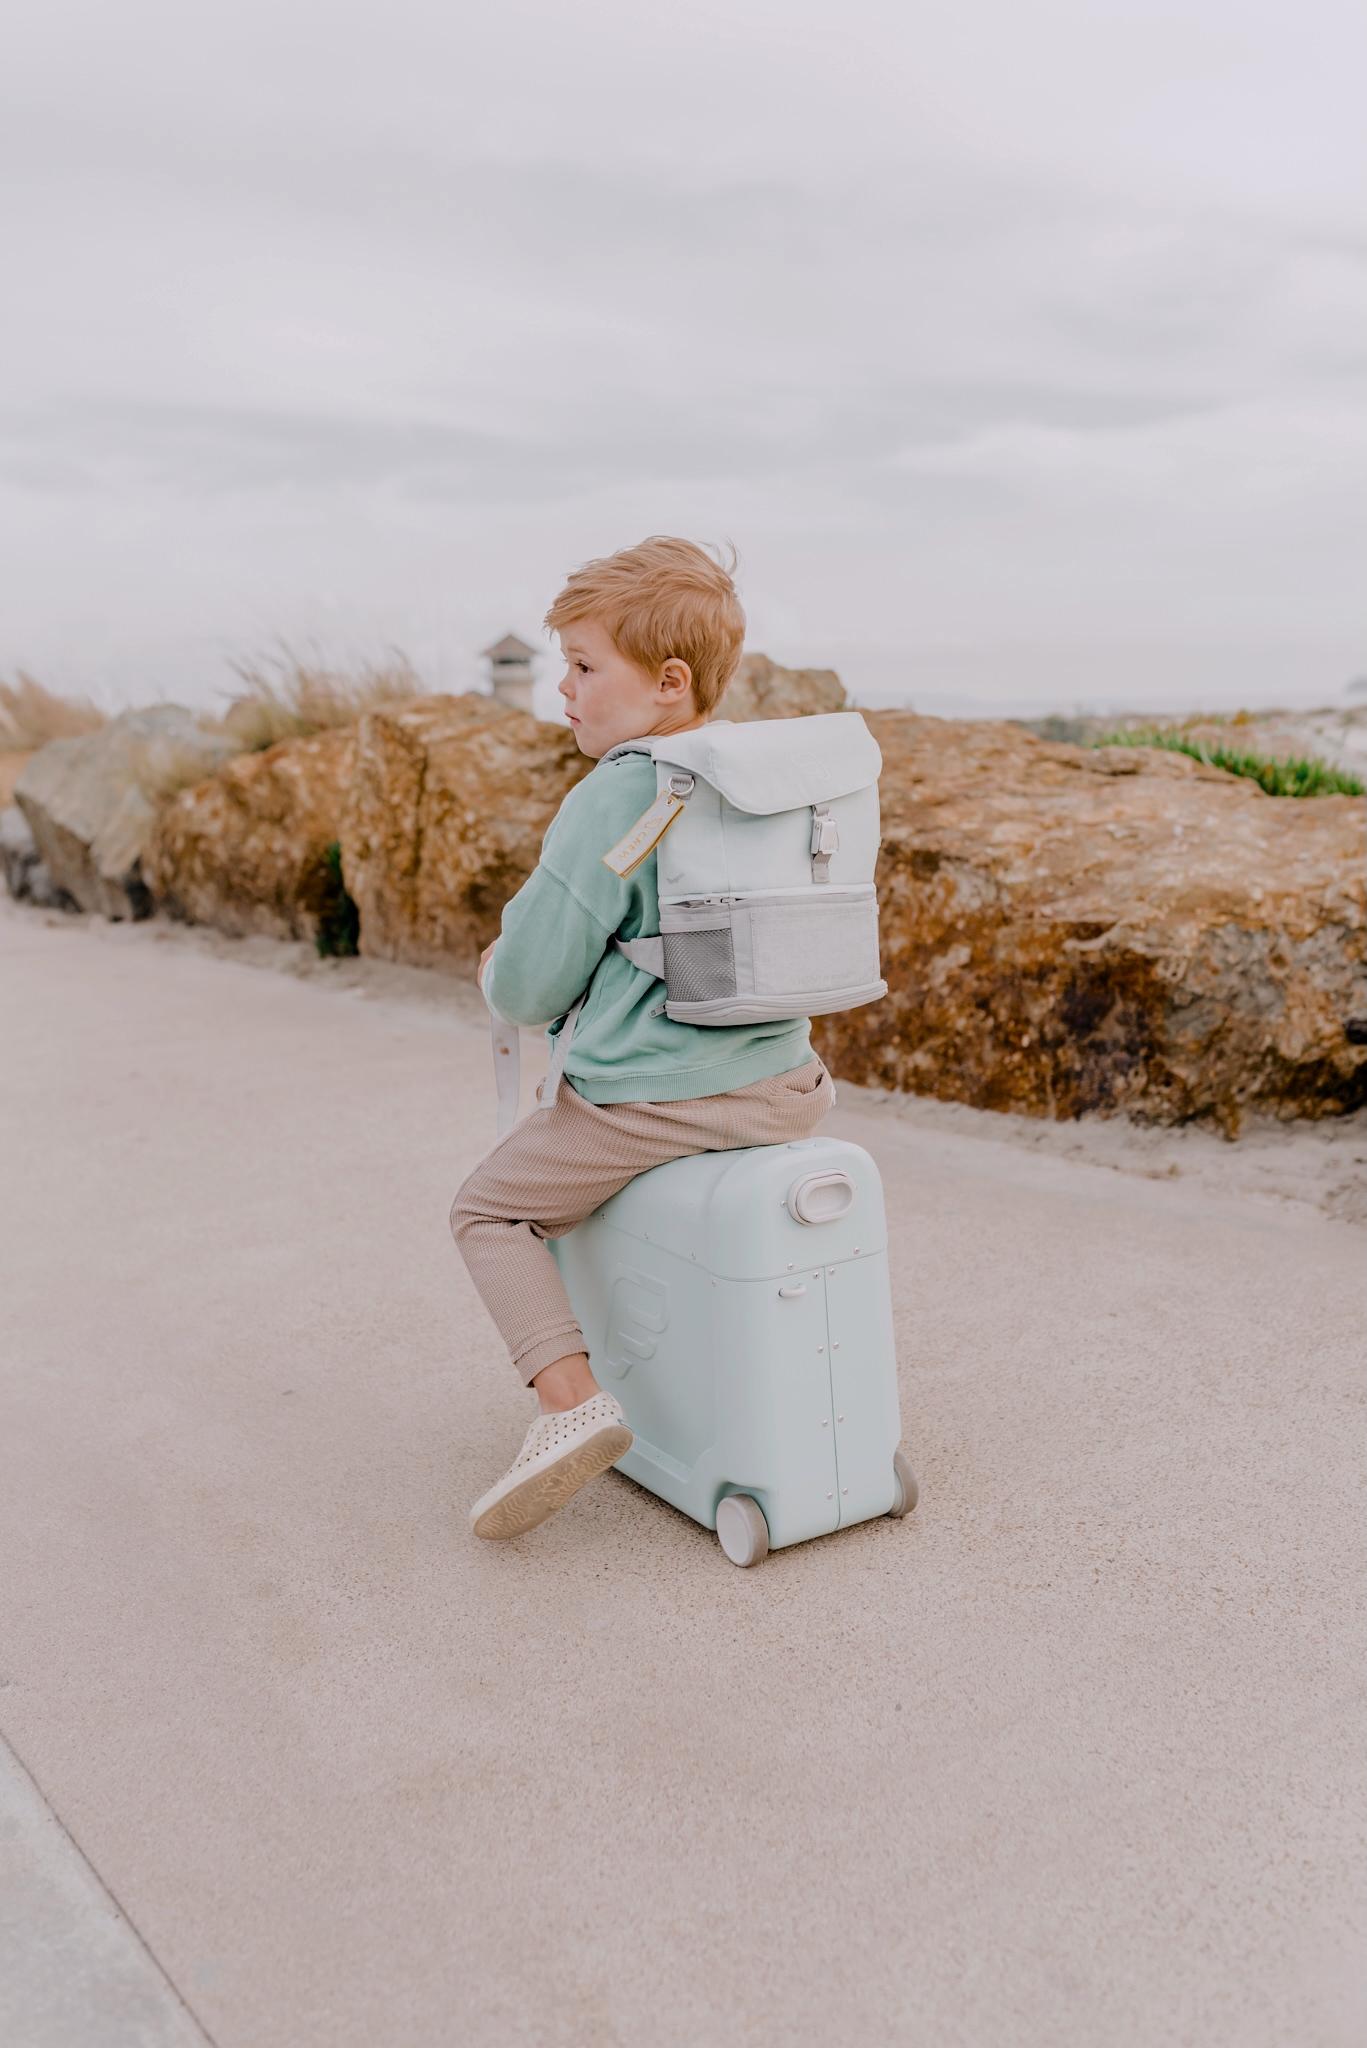 Travel Essentials for Kids - Jet kids pack suitcase